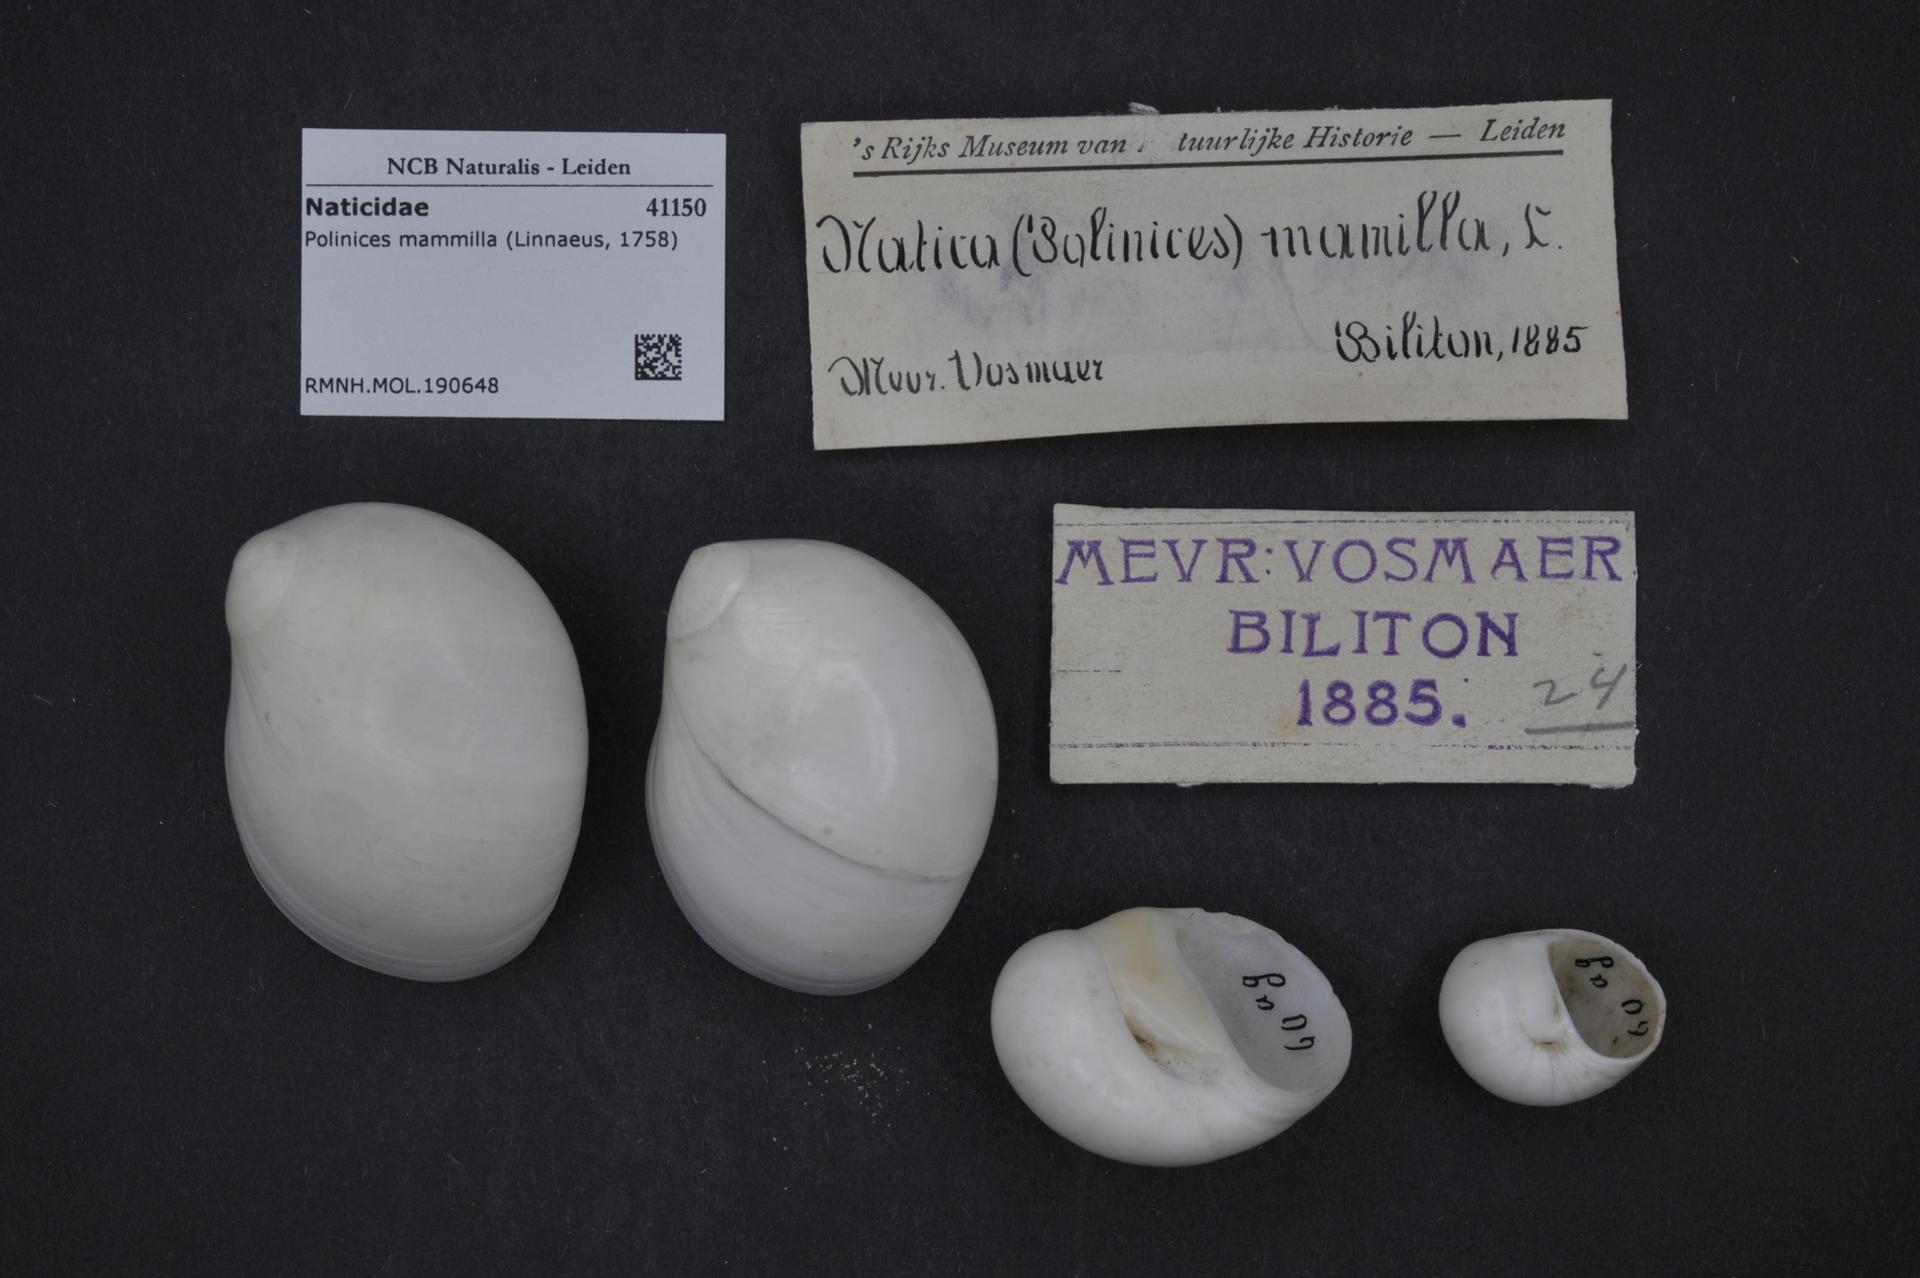 RMNH.MOL.190648 | Polinices mammilla (Linnaeus, 1758)